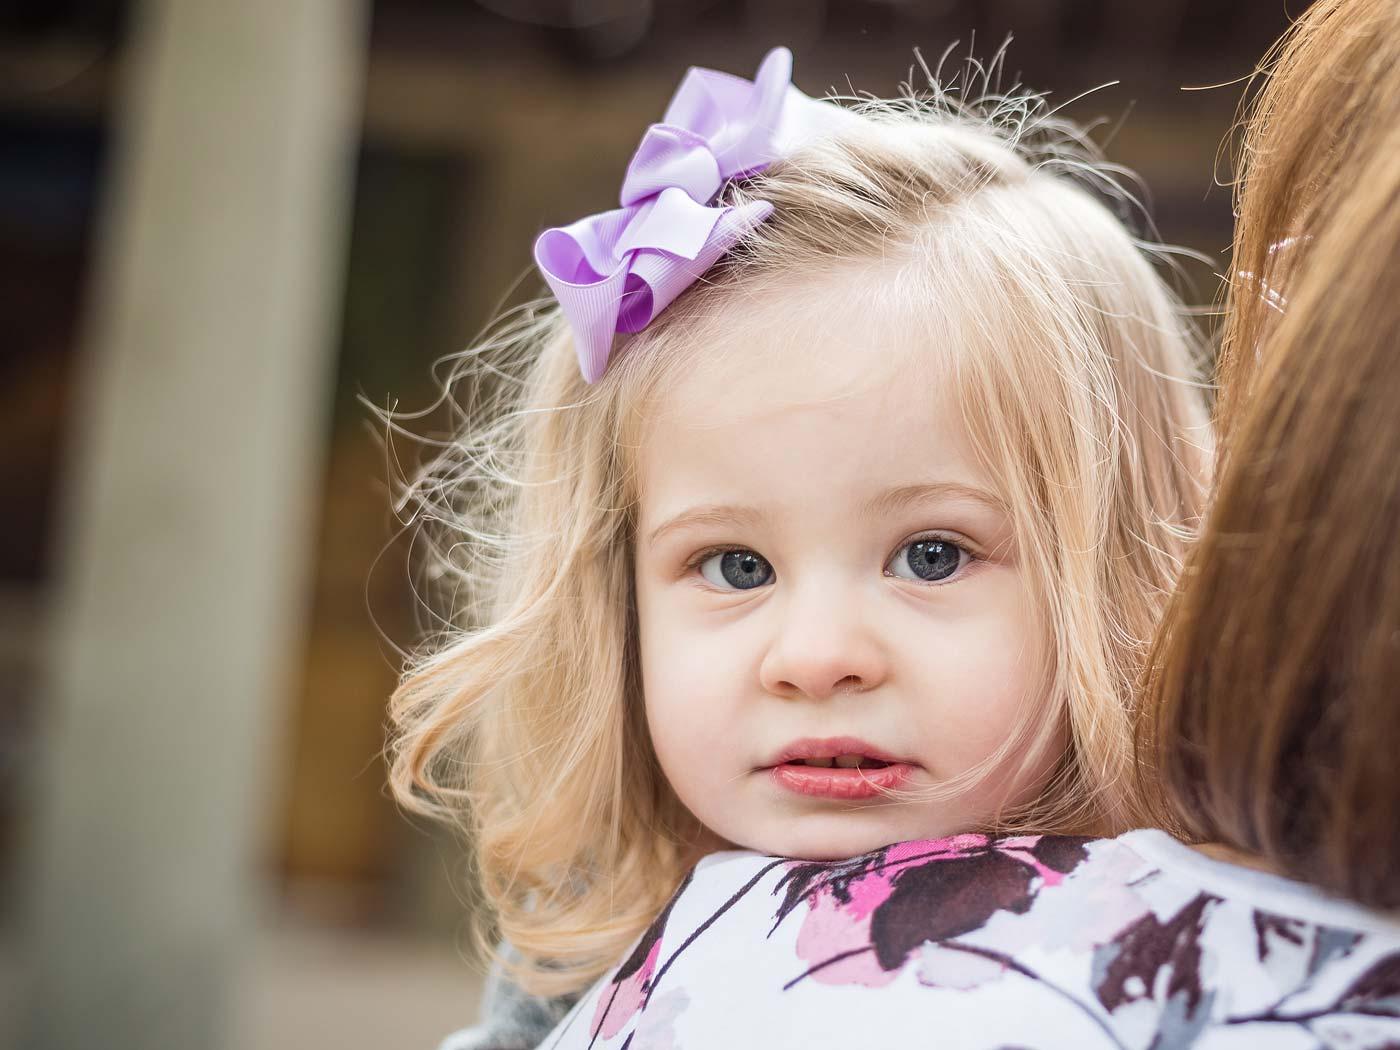 sMiss-Emma-and-Family---2-Years---Jan-2016-99.jpg